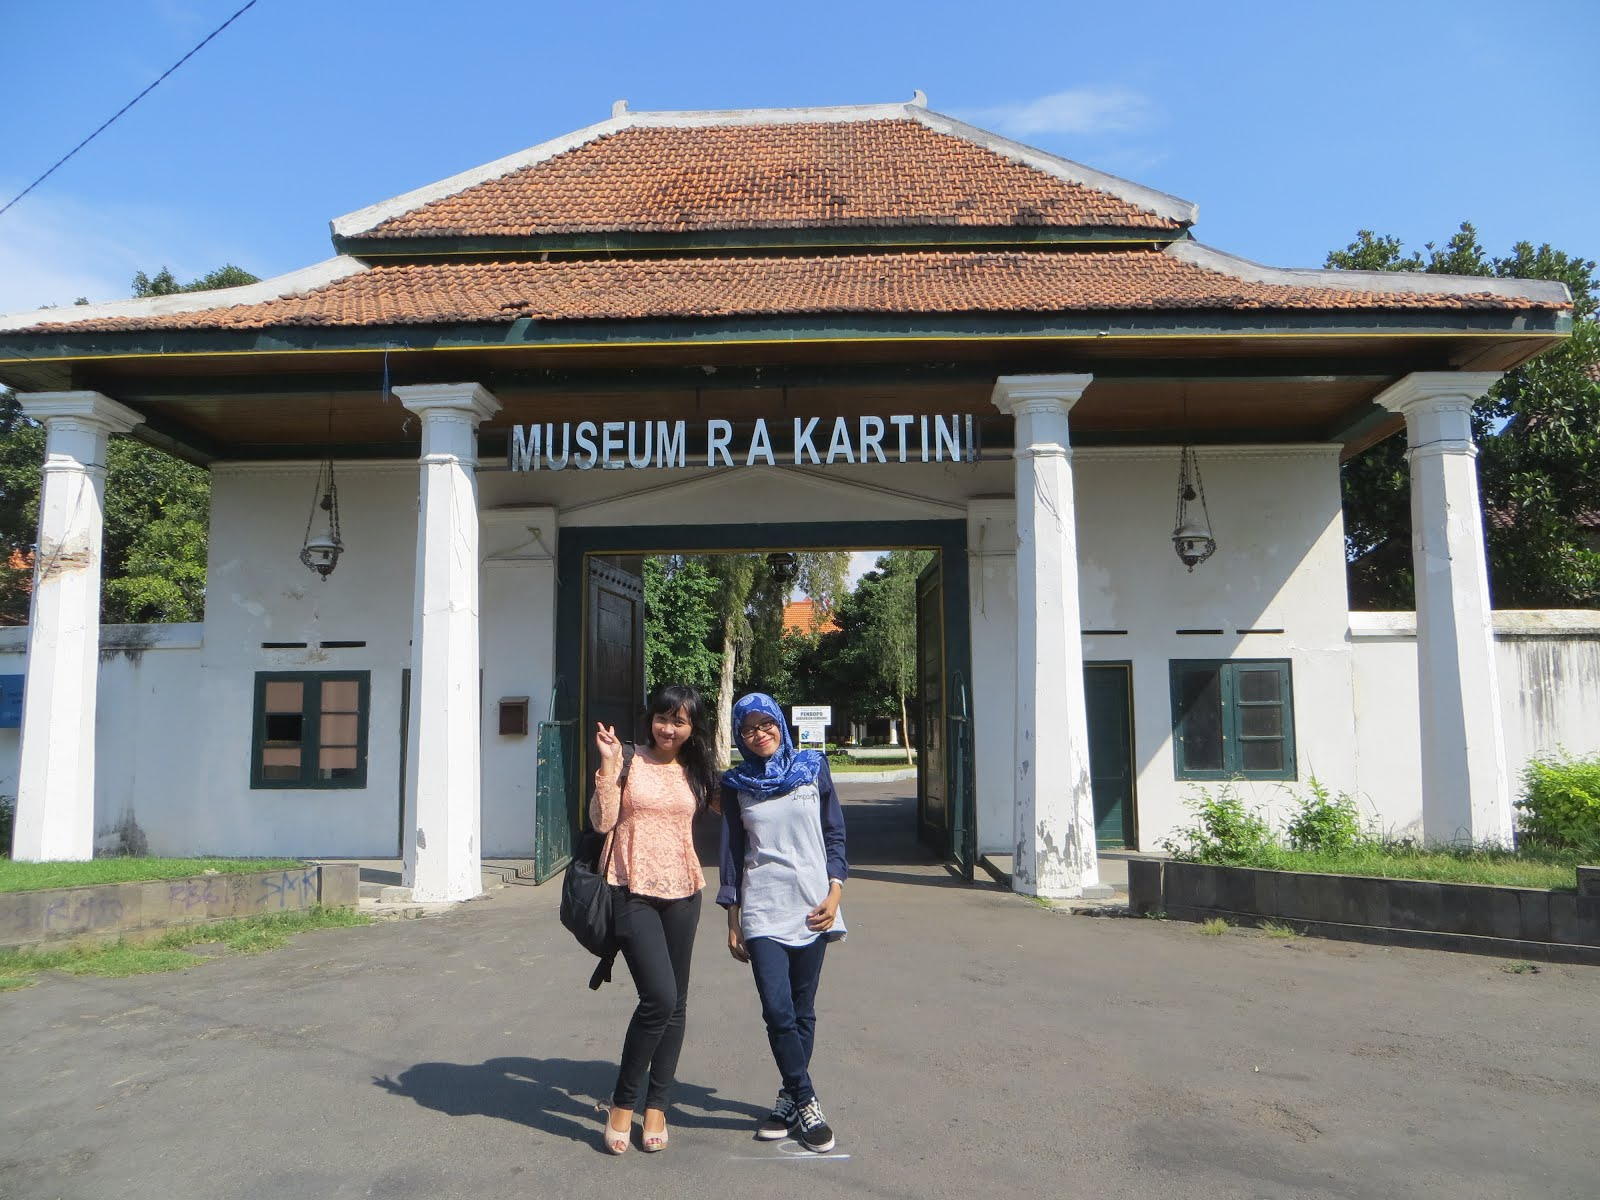 Museum Kartini, Rembang